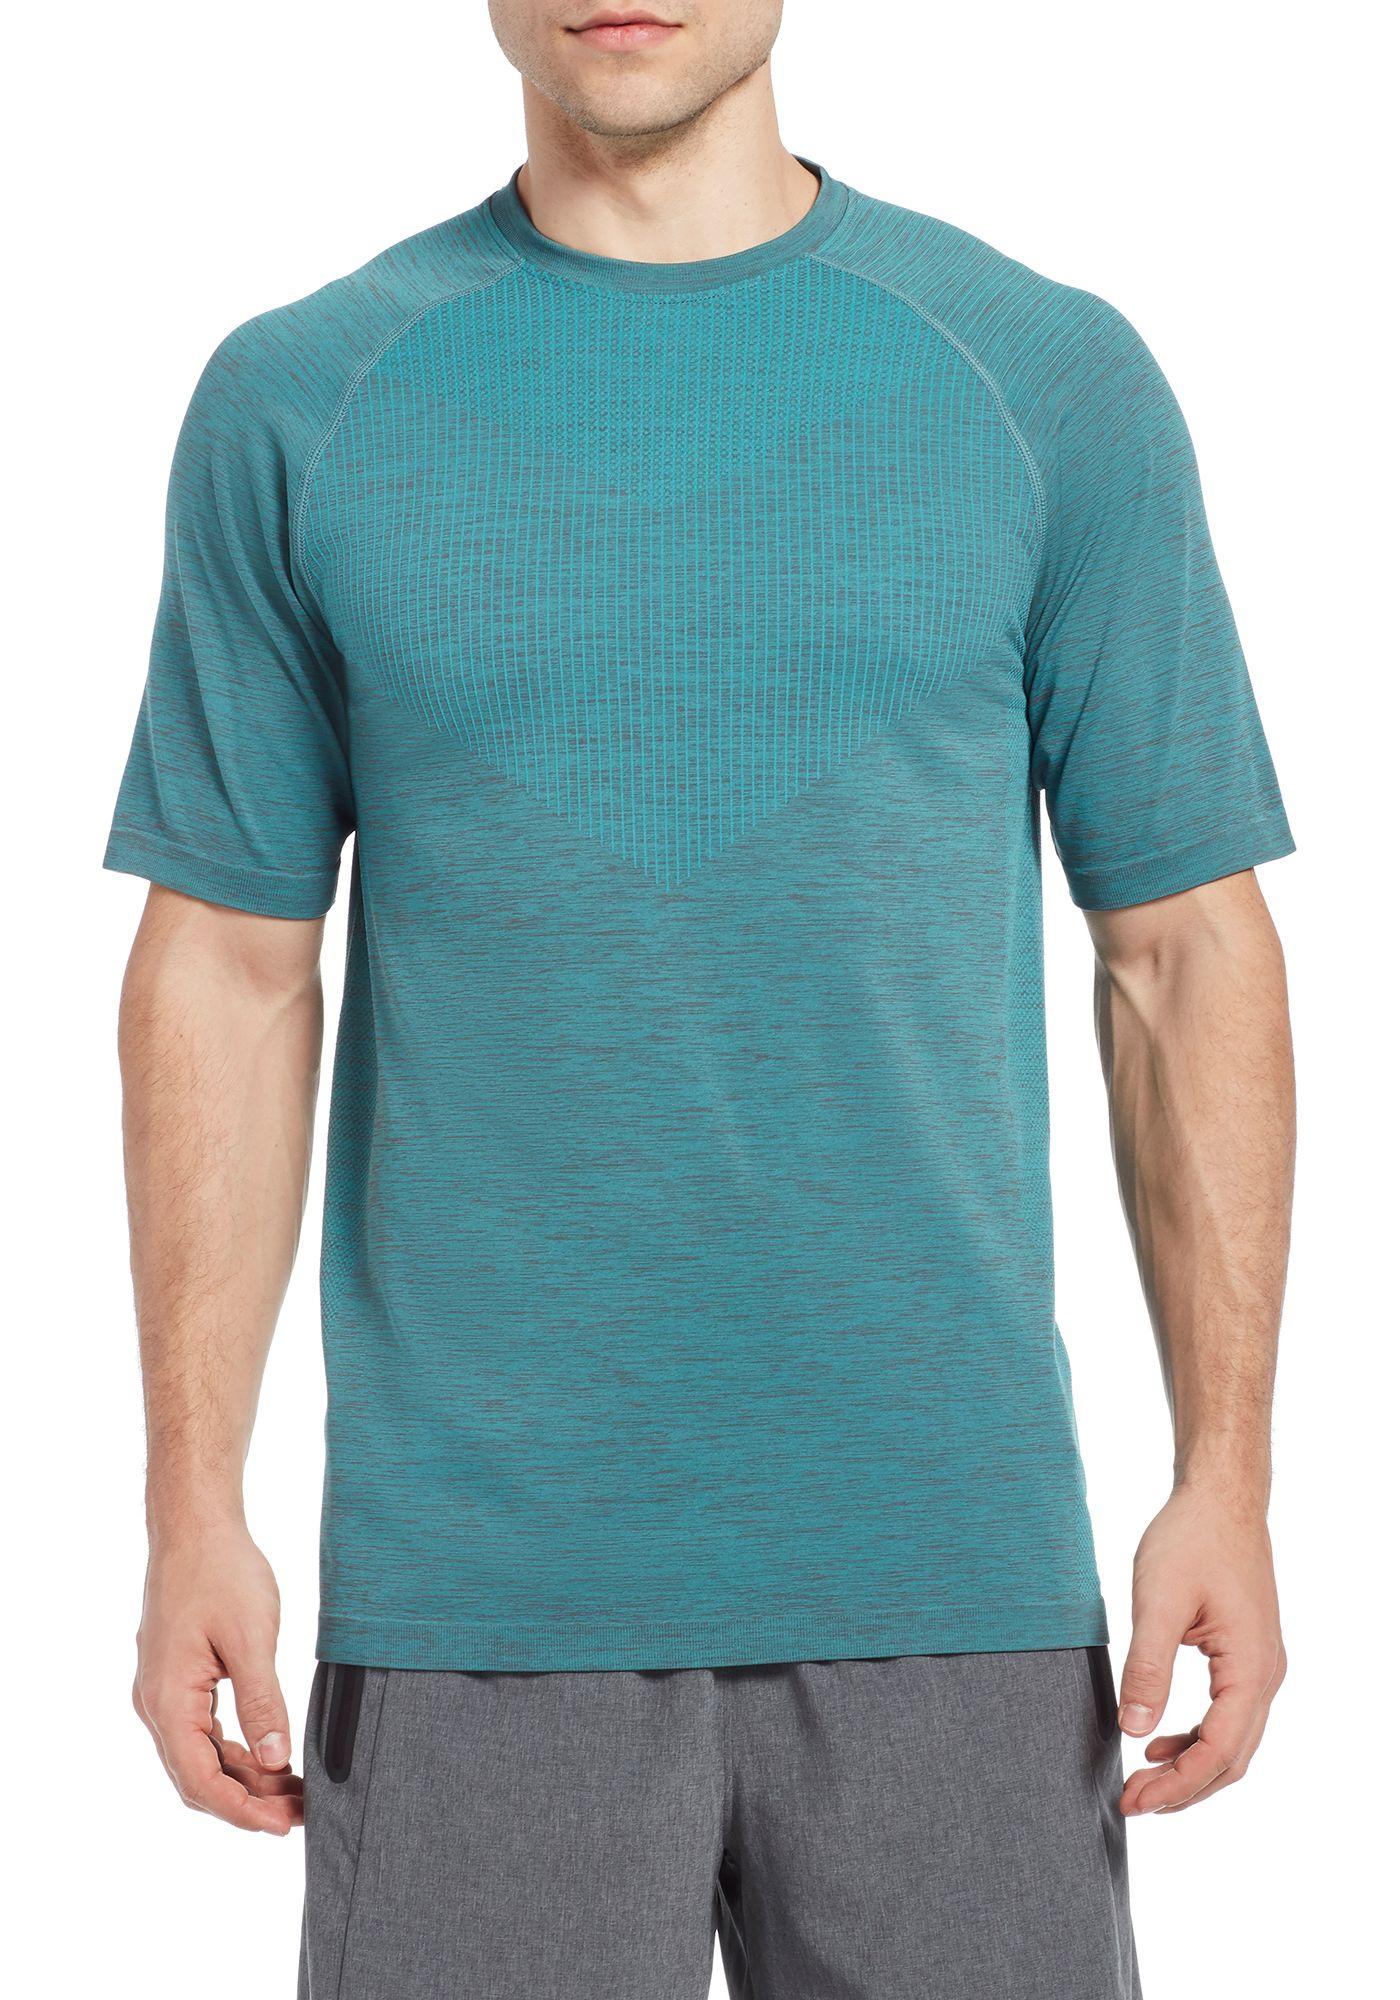 SECOND SKIN Men's Training Seamless T-Shirt